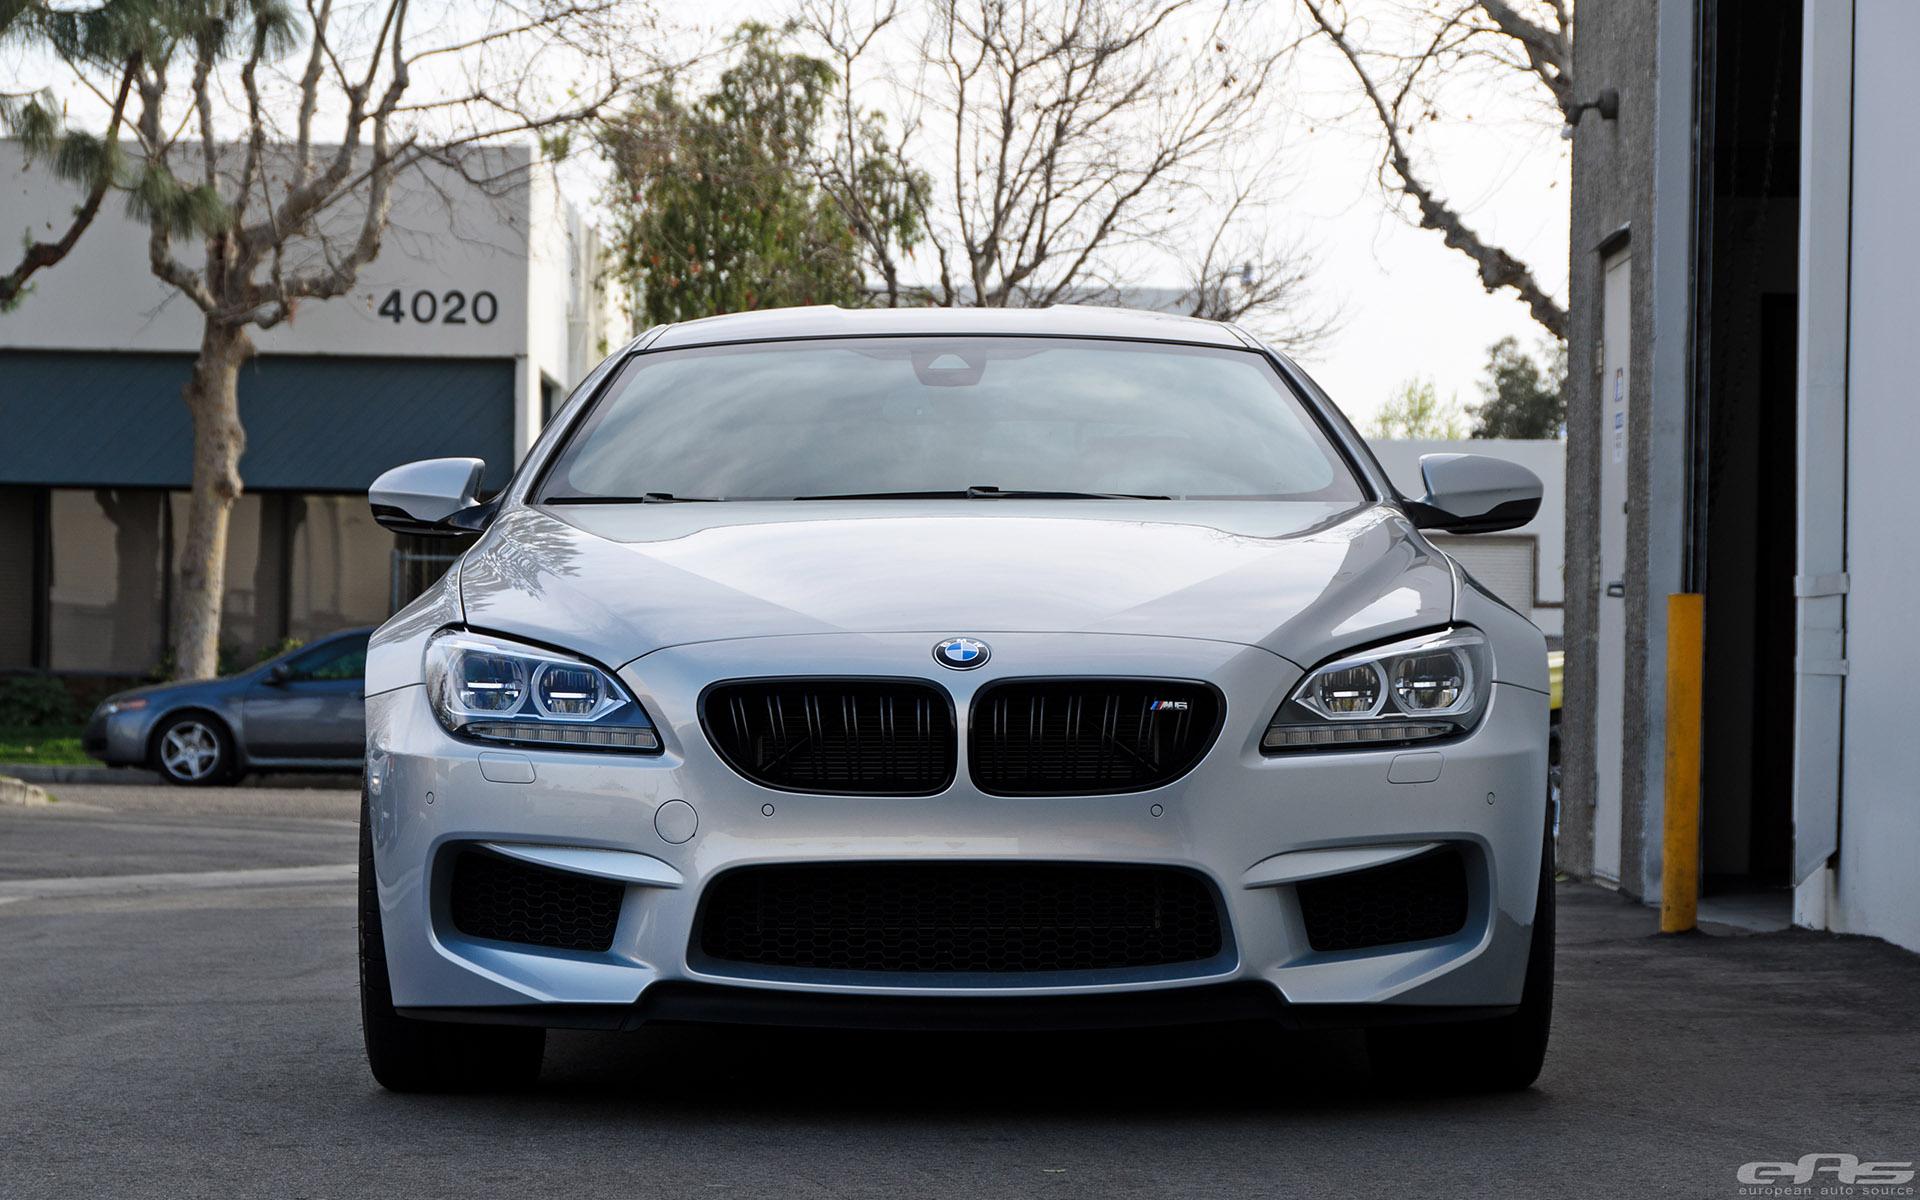 Moonstone Metallic BMW F13 M6 Tuned At EAS Image 20